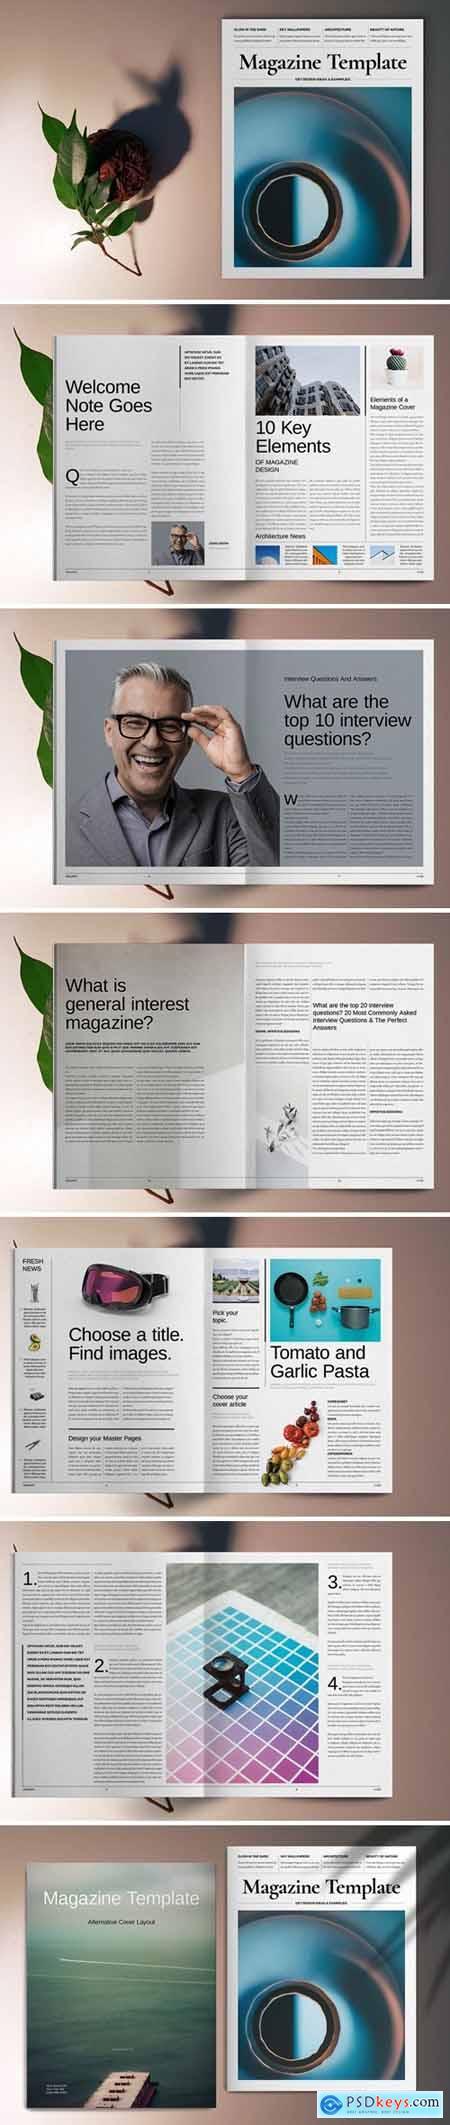 Lifestyle Magazine Template 5667405